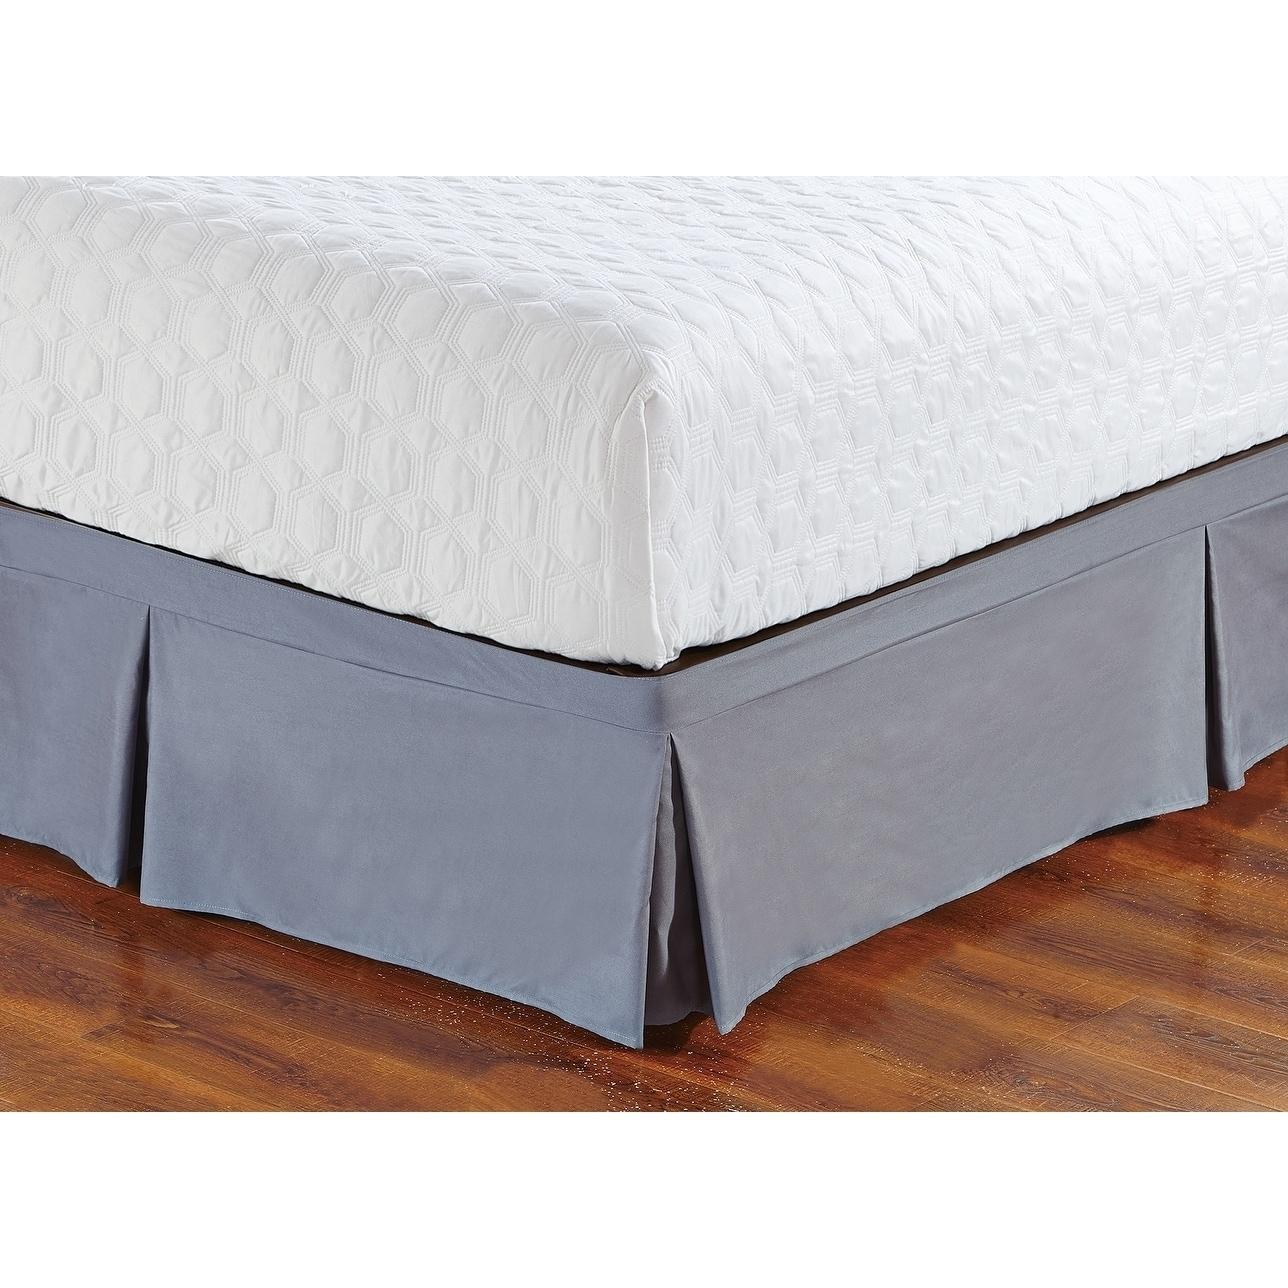 Shop De Moocci Wrap Around Style Tailored Bed Skirt 16 Drop